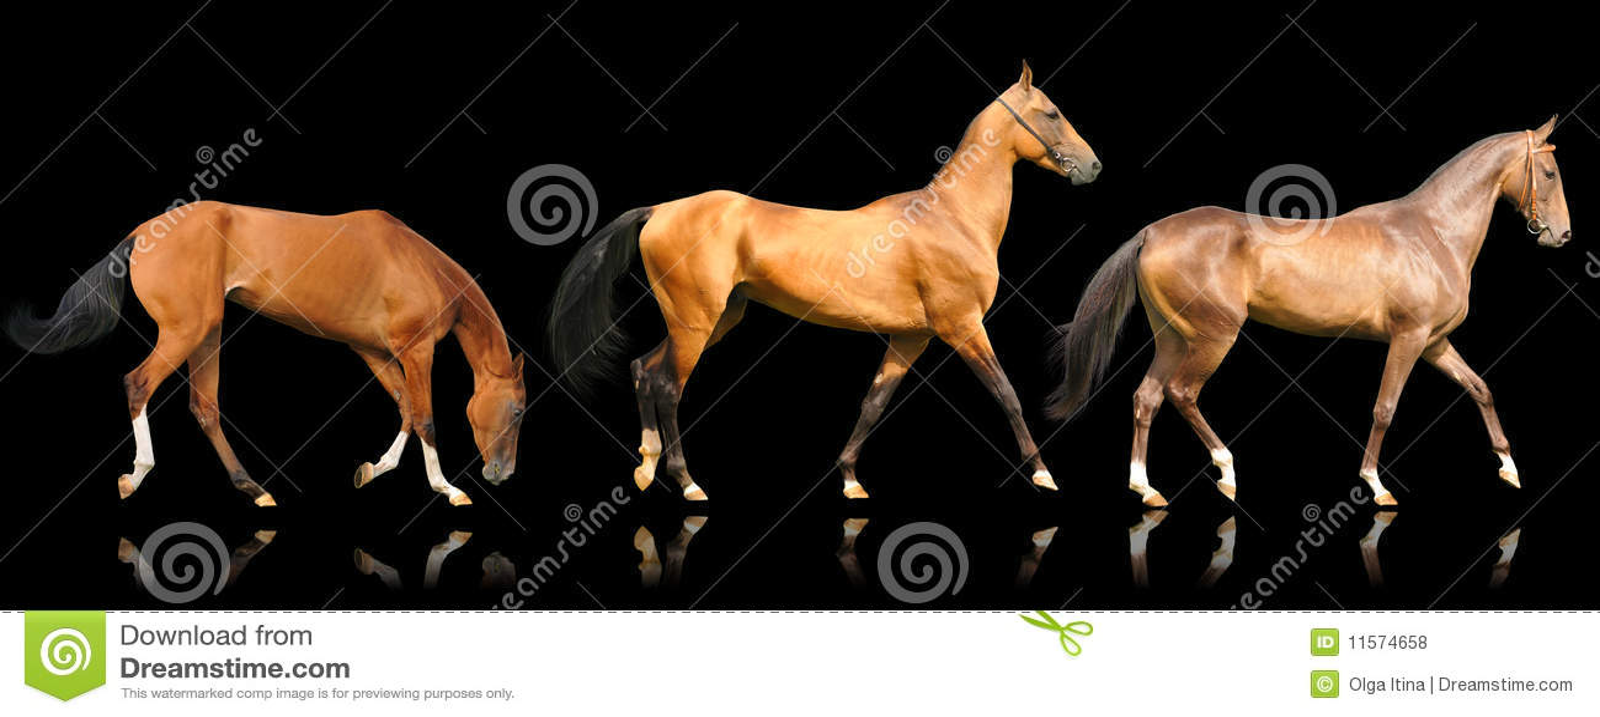 Tres caballos del akhal-teke aislados en negro